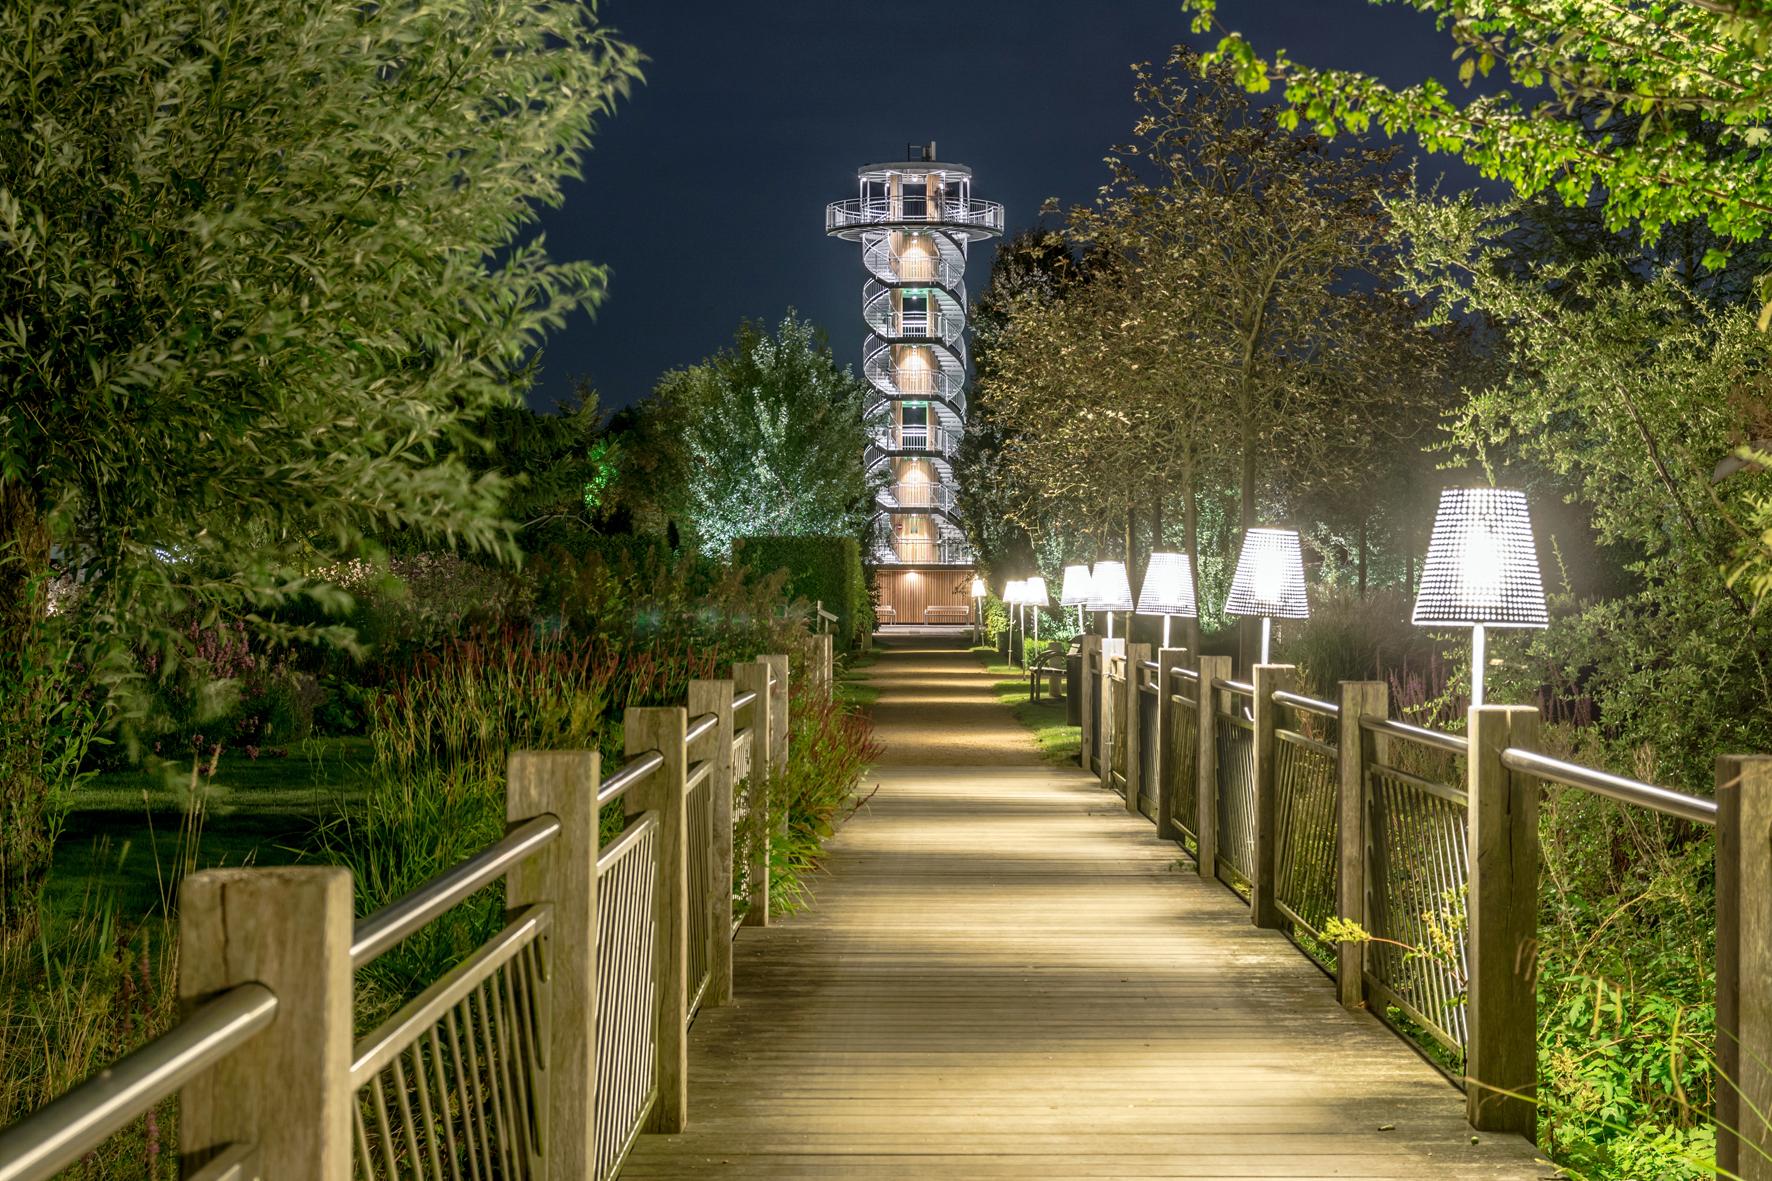 Illumination – Lichtzauber im Park